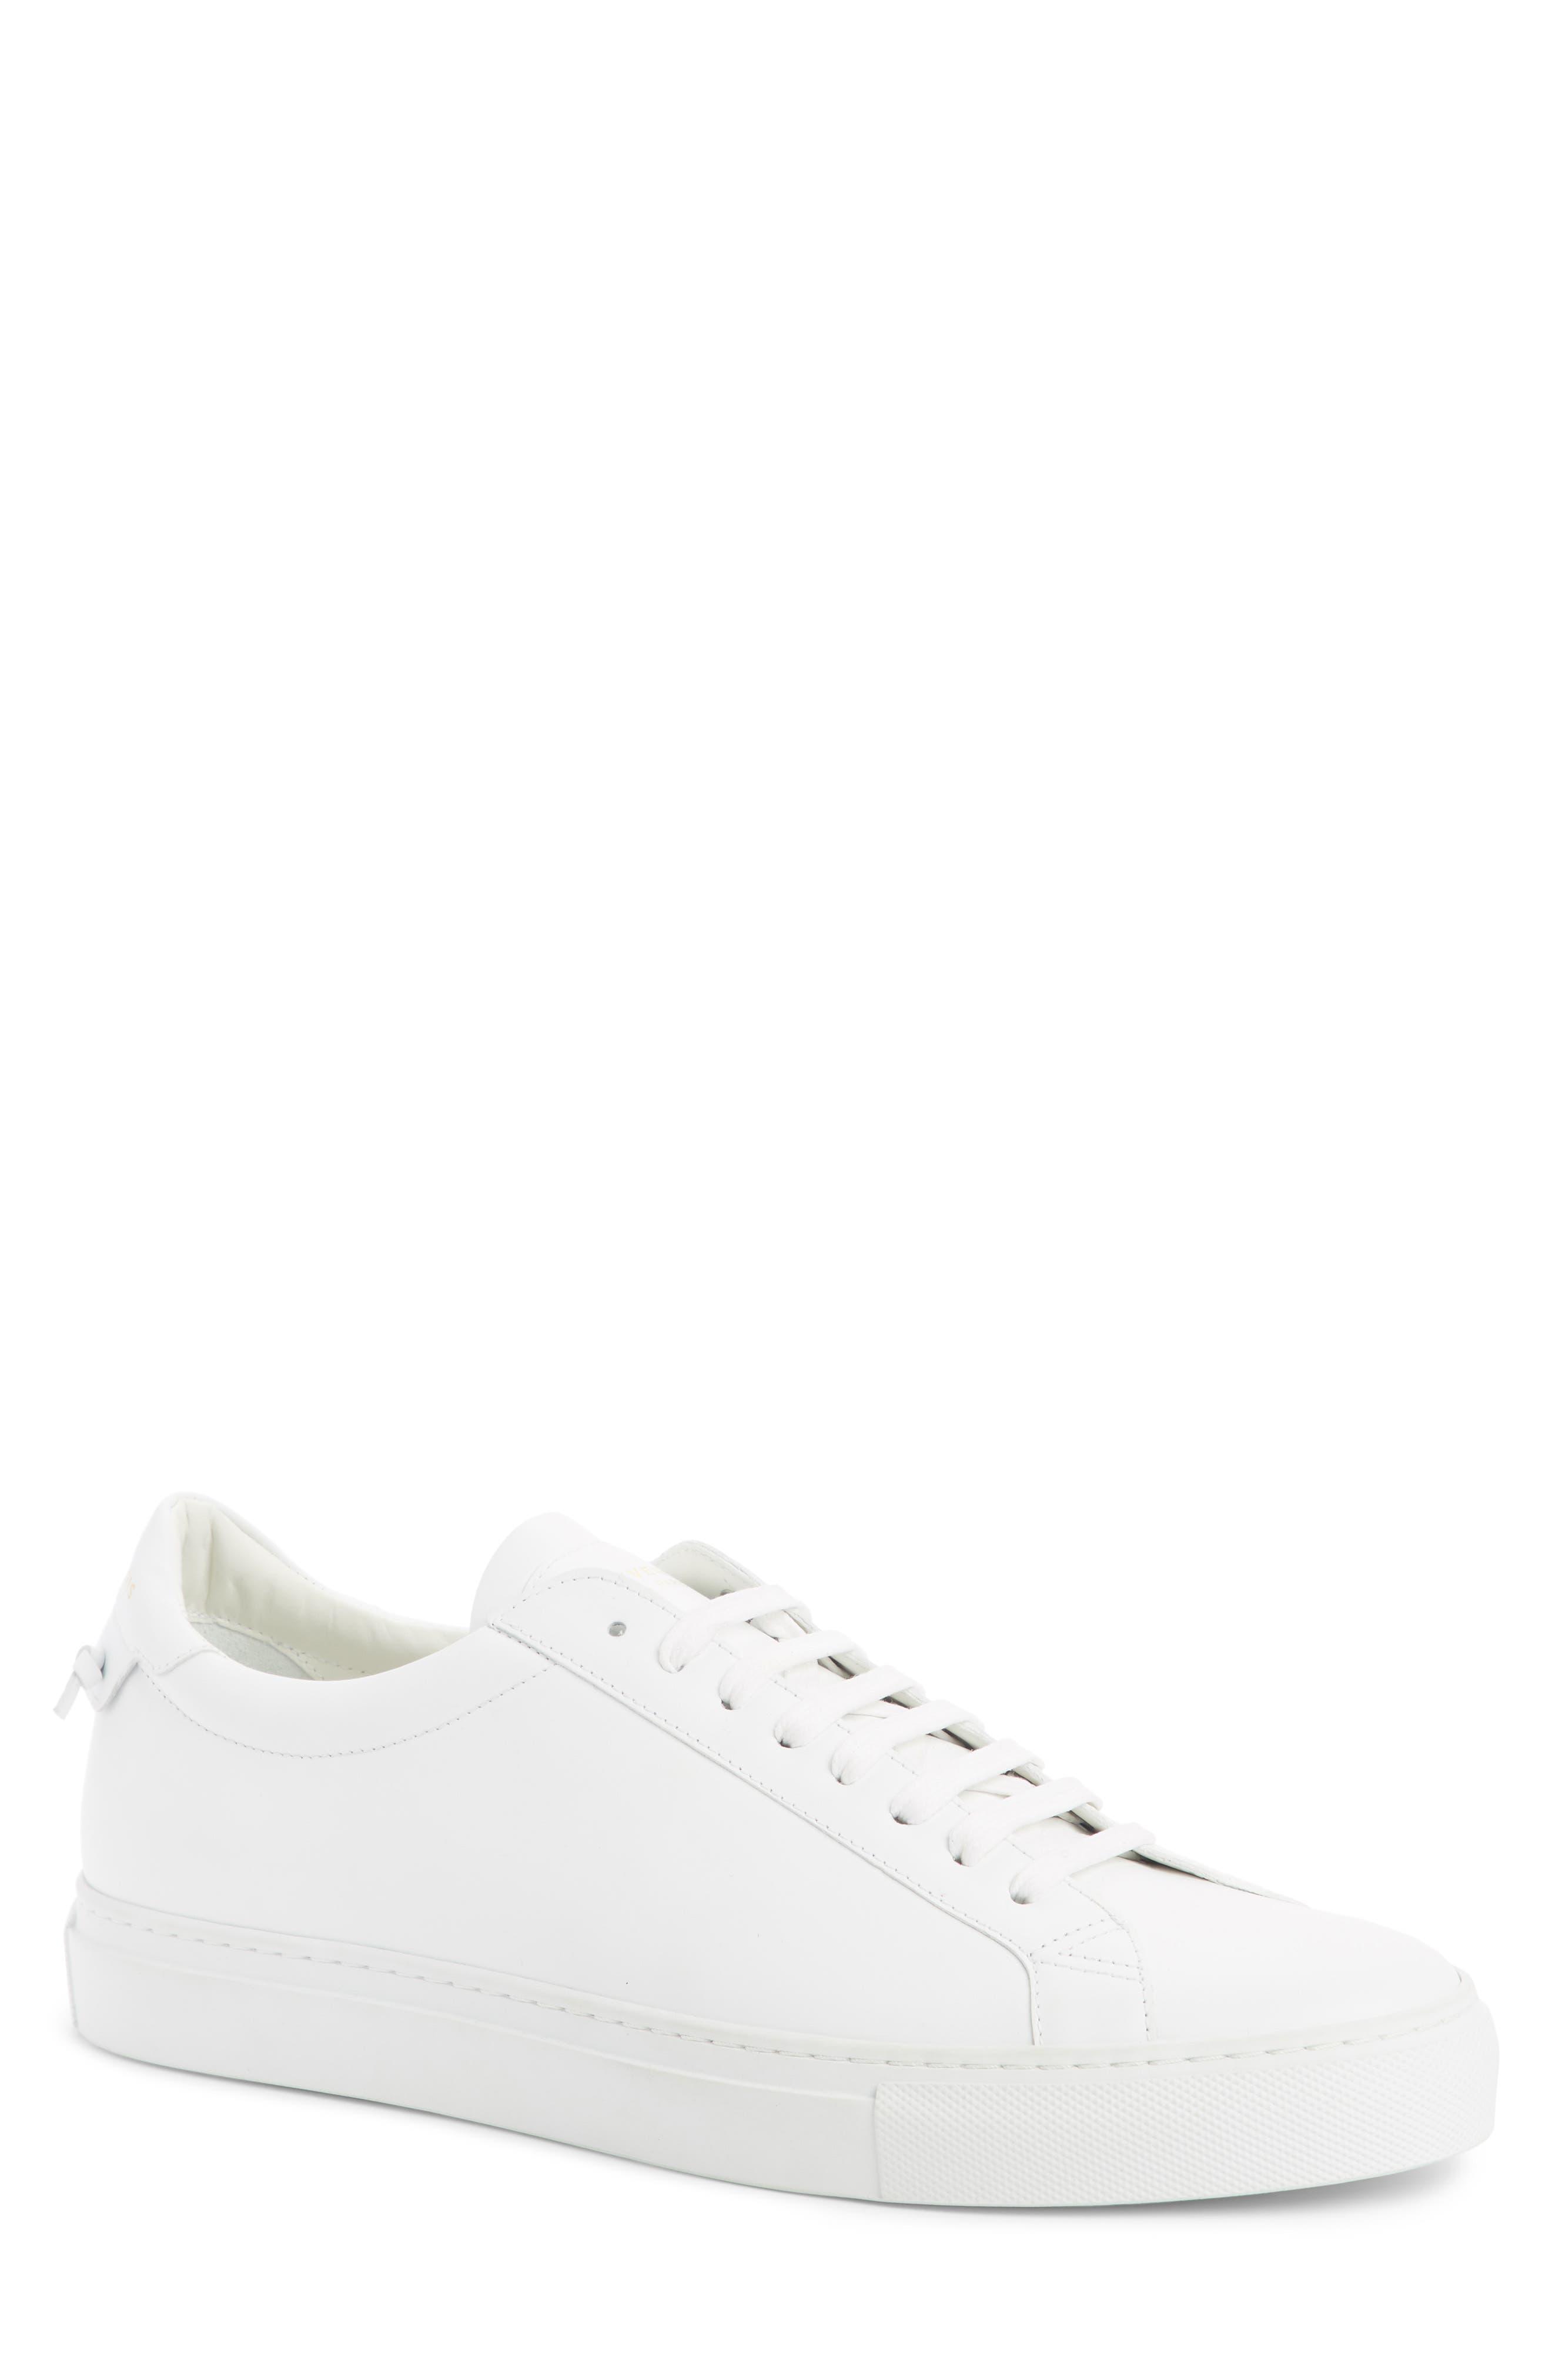 'Urban Knots Lo' Sneaker,                             Main thumbnail 1, color,                             WHITE/ WHITE